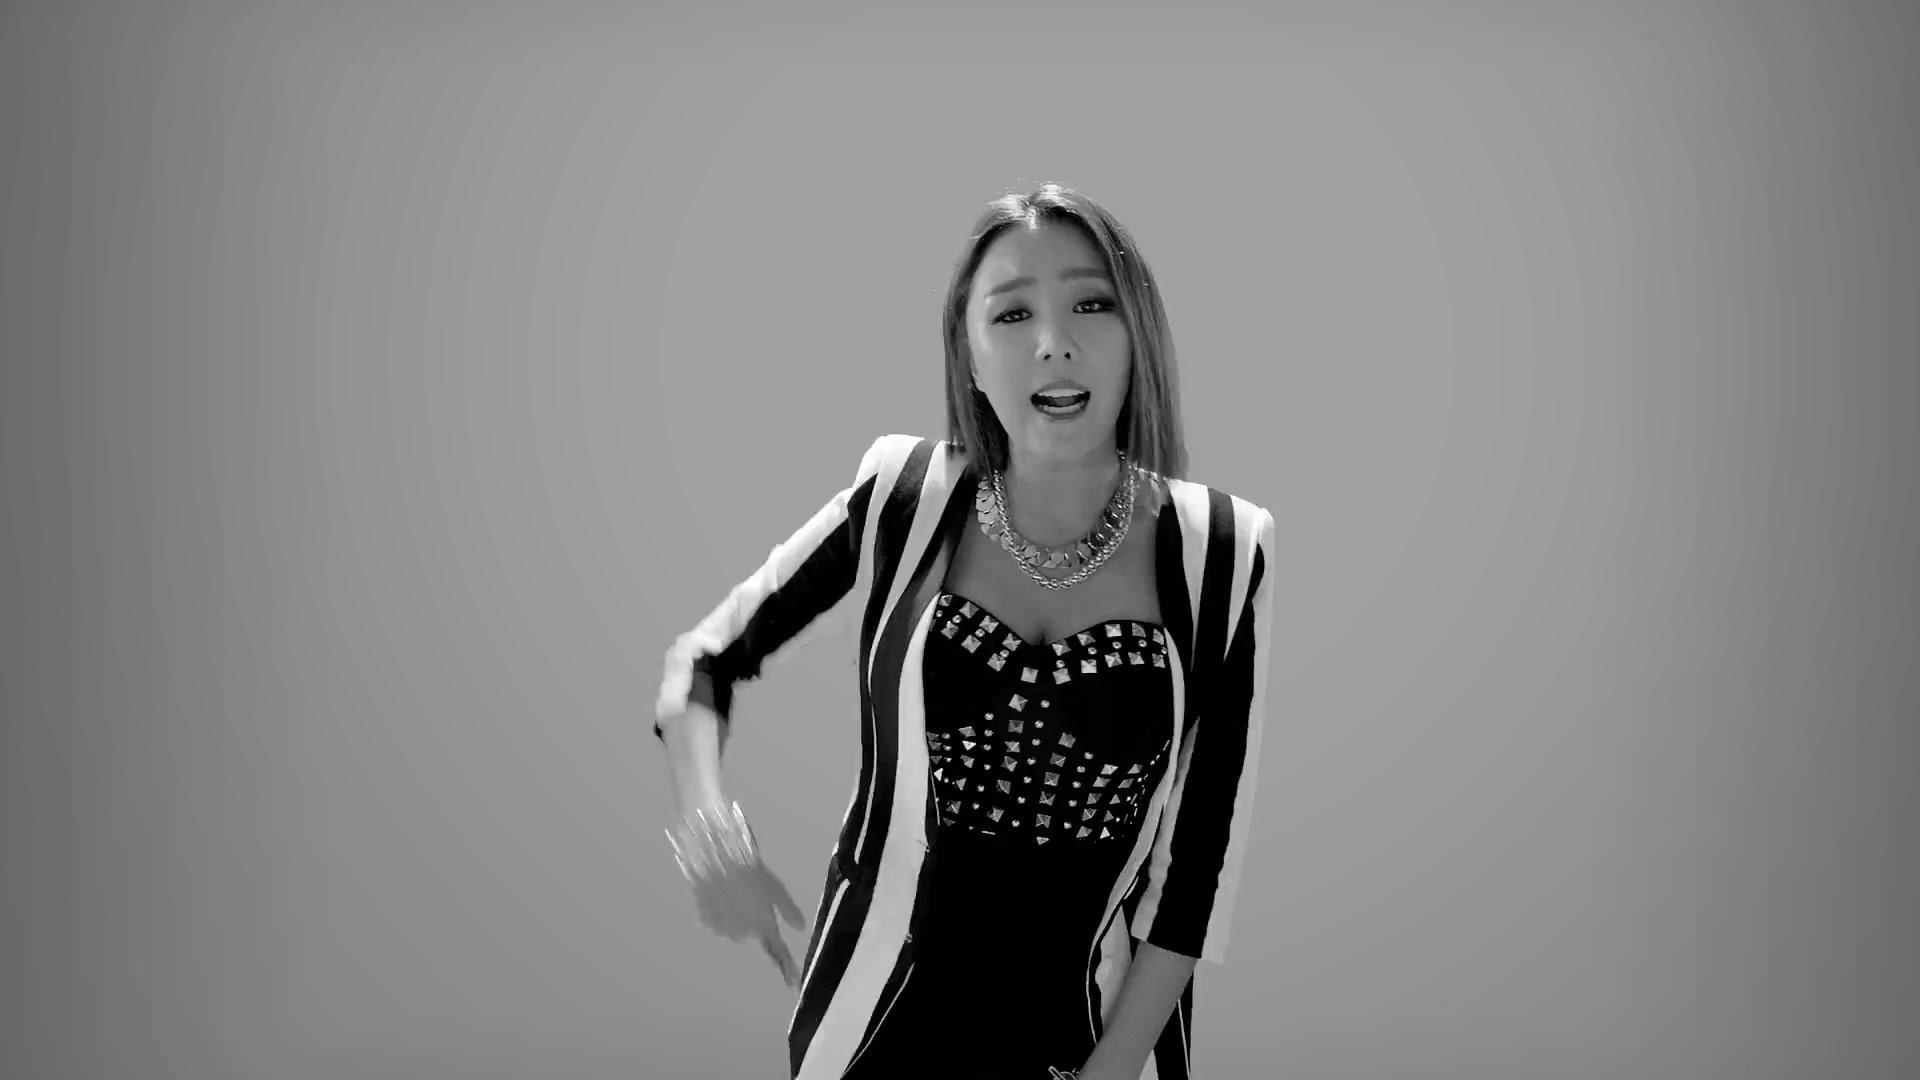 Jace in Kisum x Lil Cham x Jace x Bora x Adoonga Feedback MV